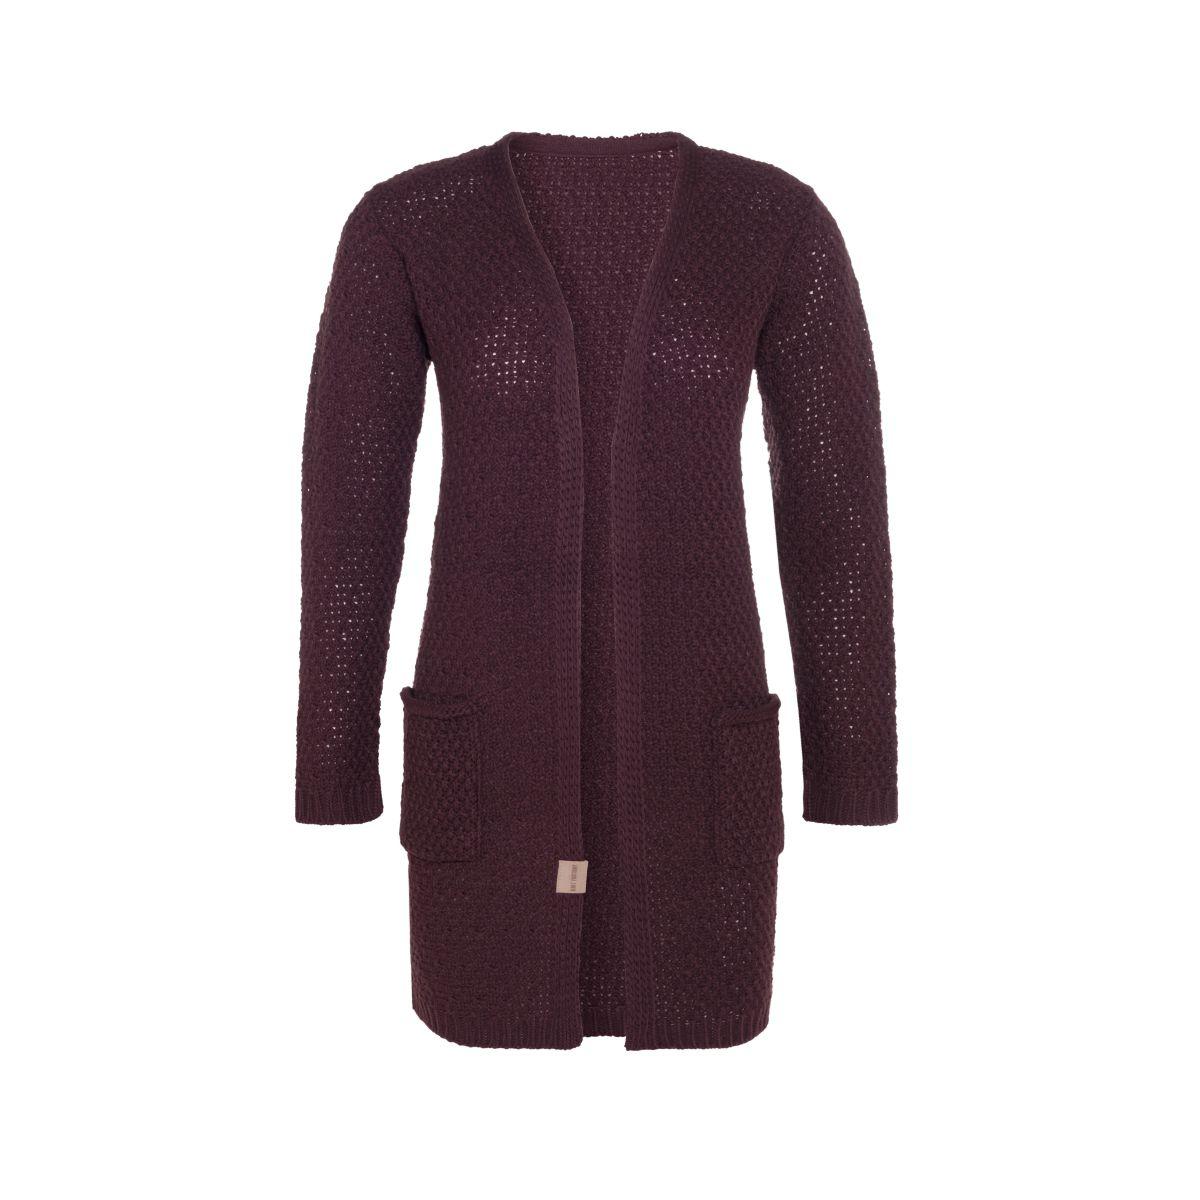 knit factory kf13308102351 luna vest aubergine 4042 1